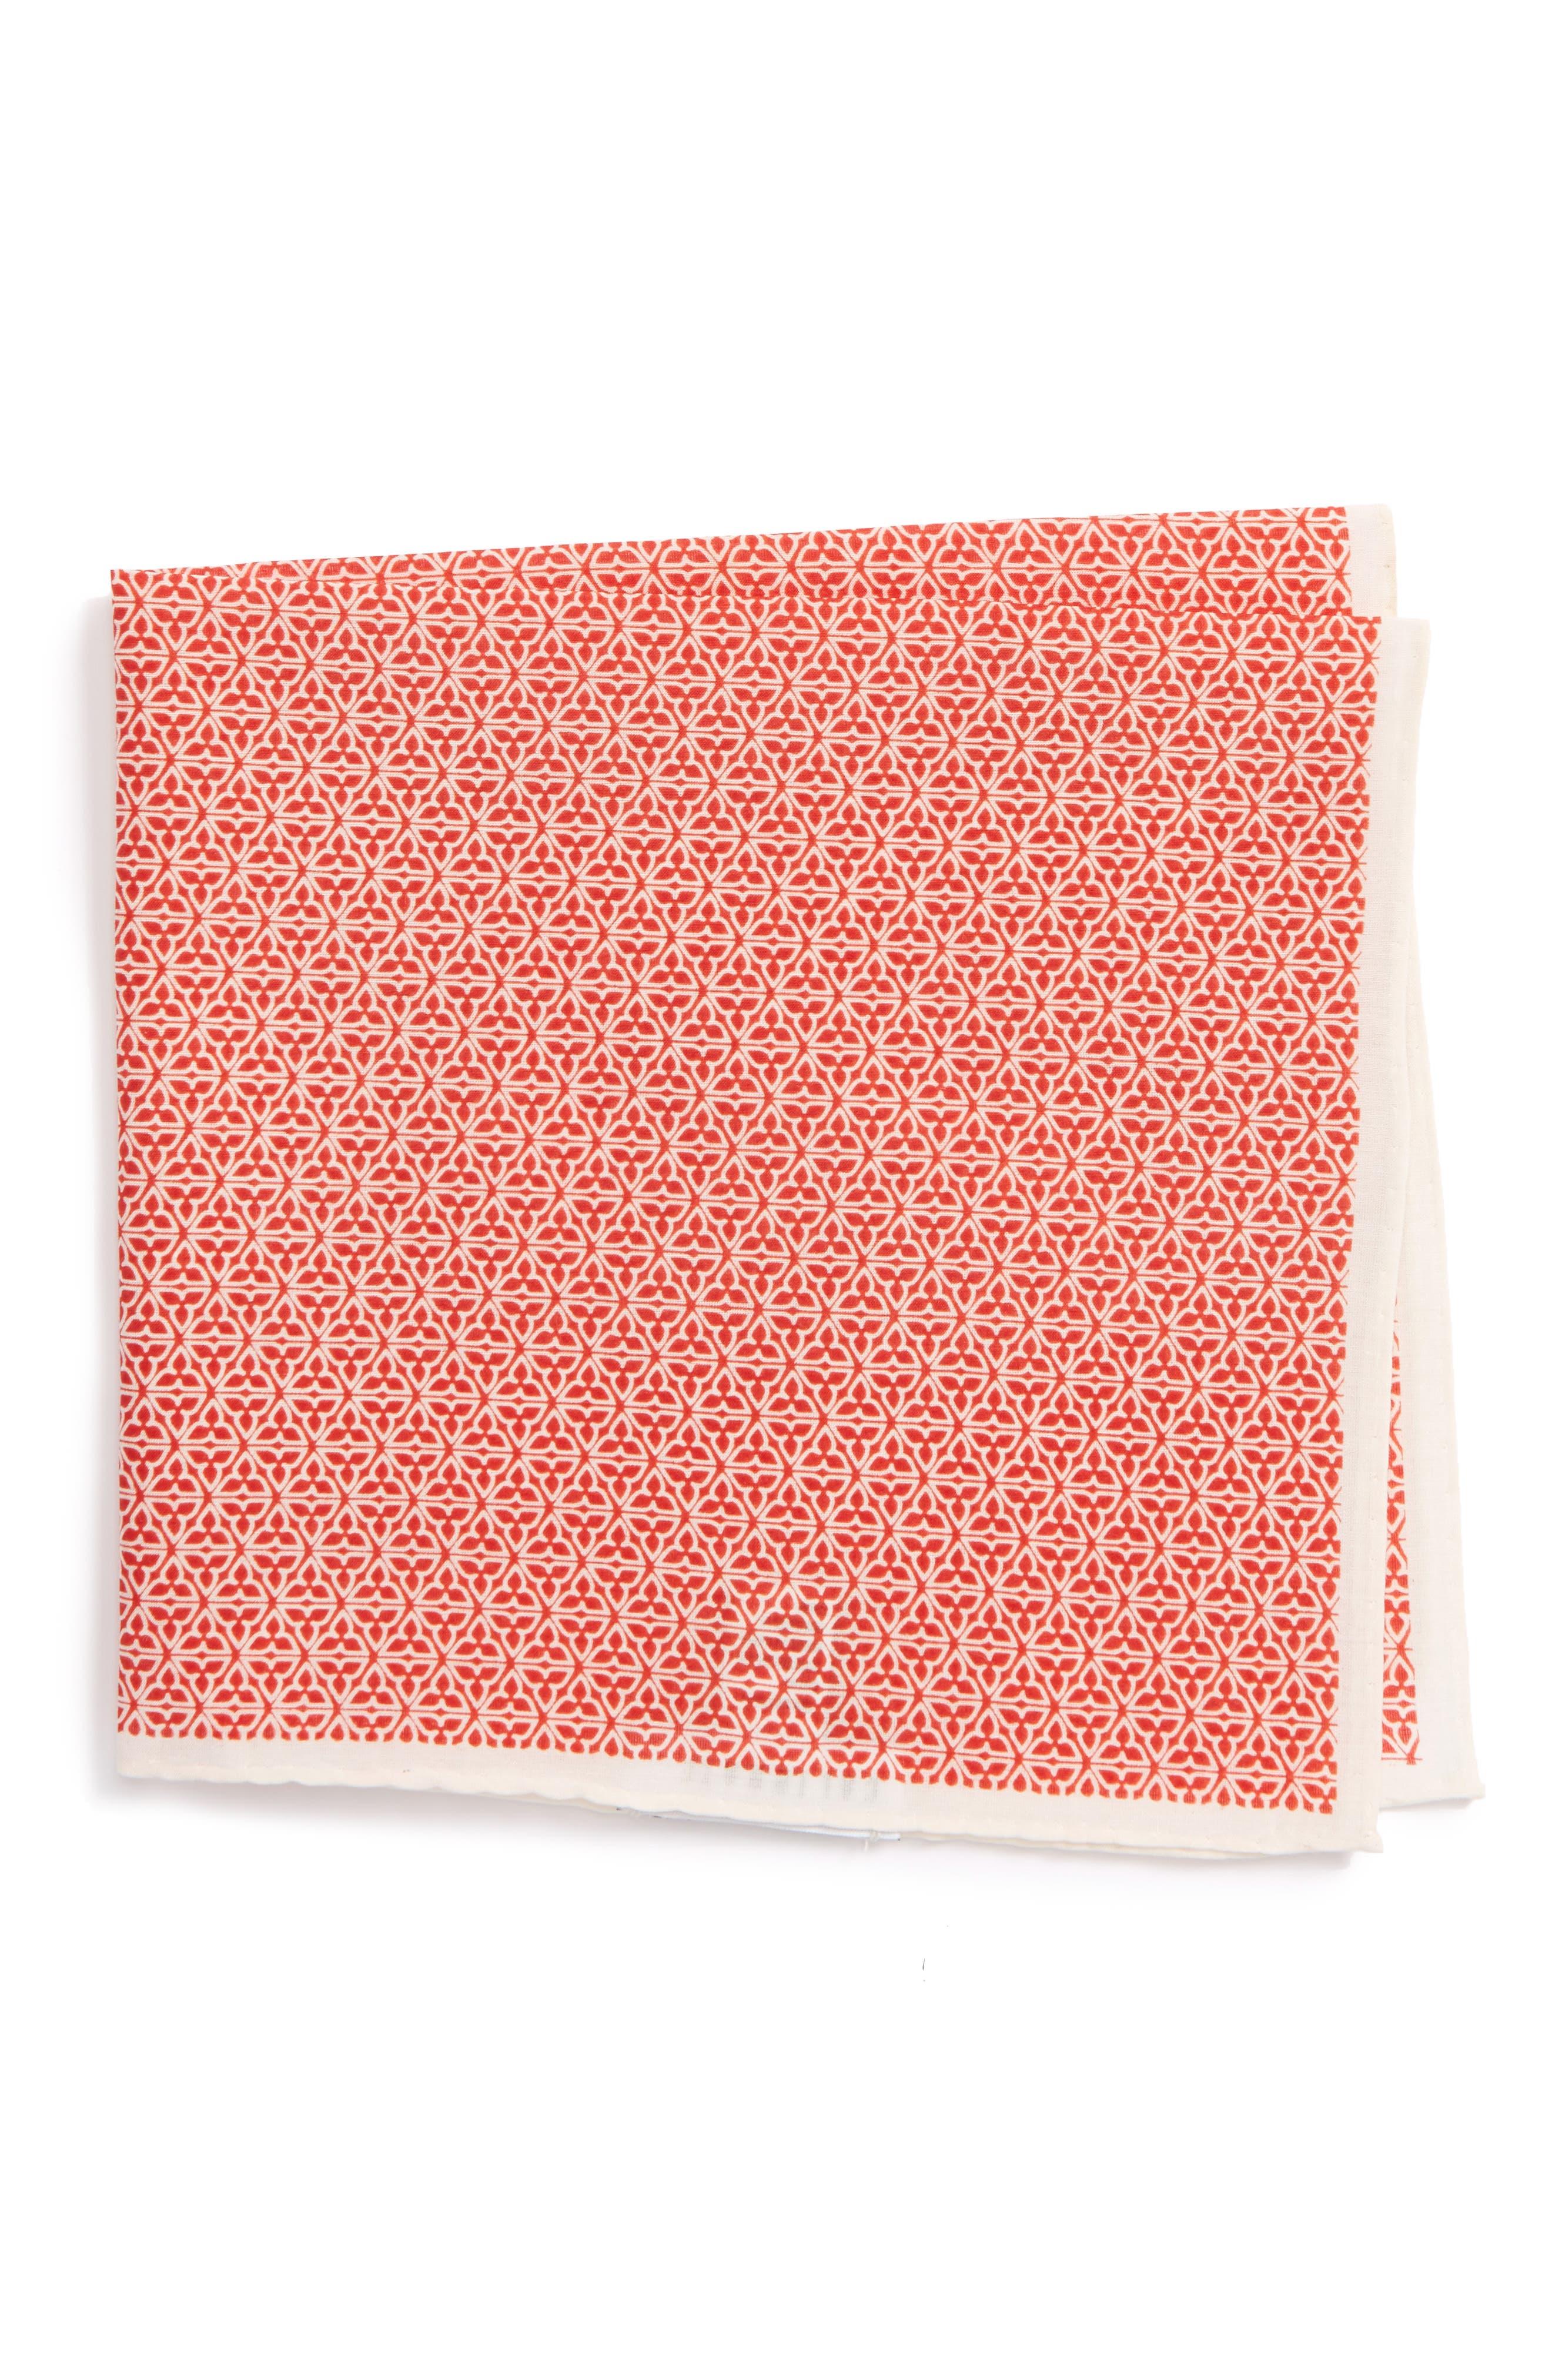 Alternate Image 1 Selected - Calibrate Clover Cotton & Silk Pocket Square